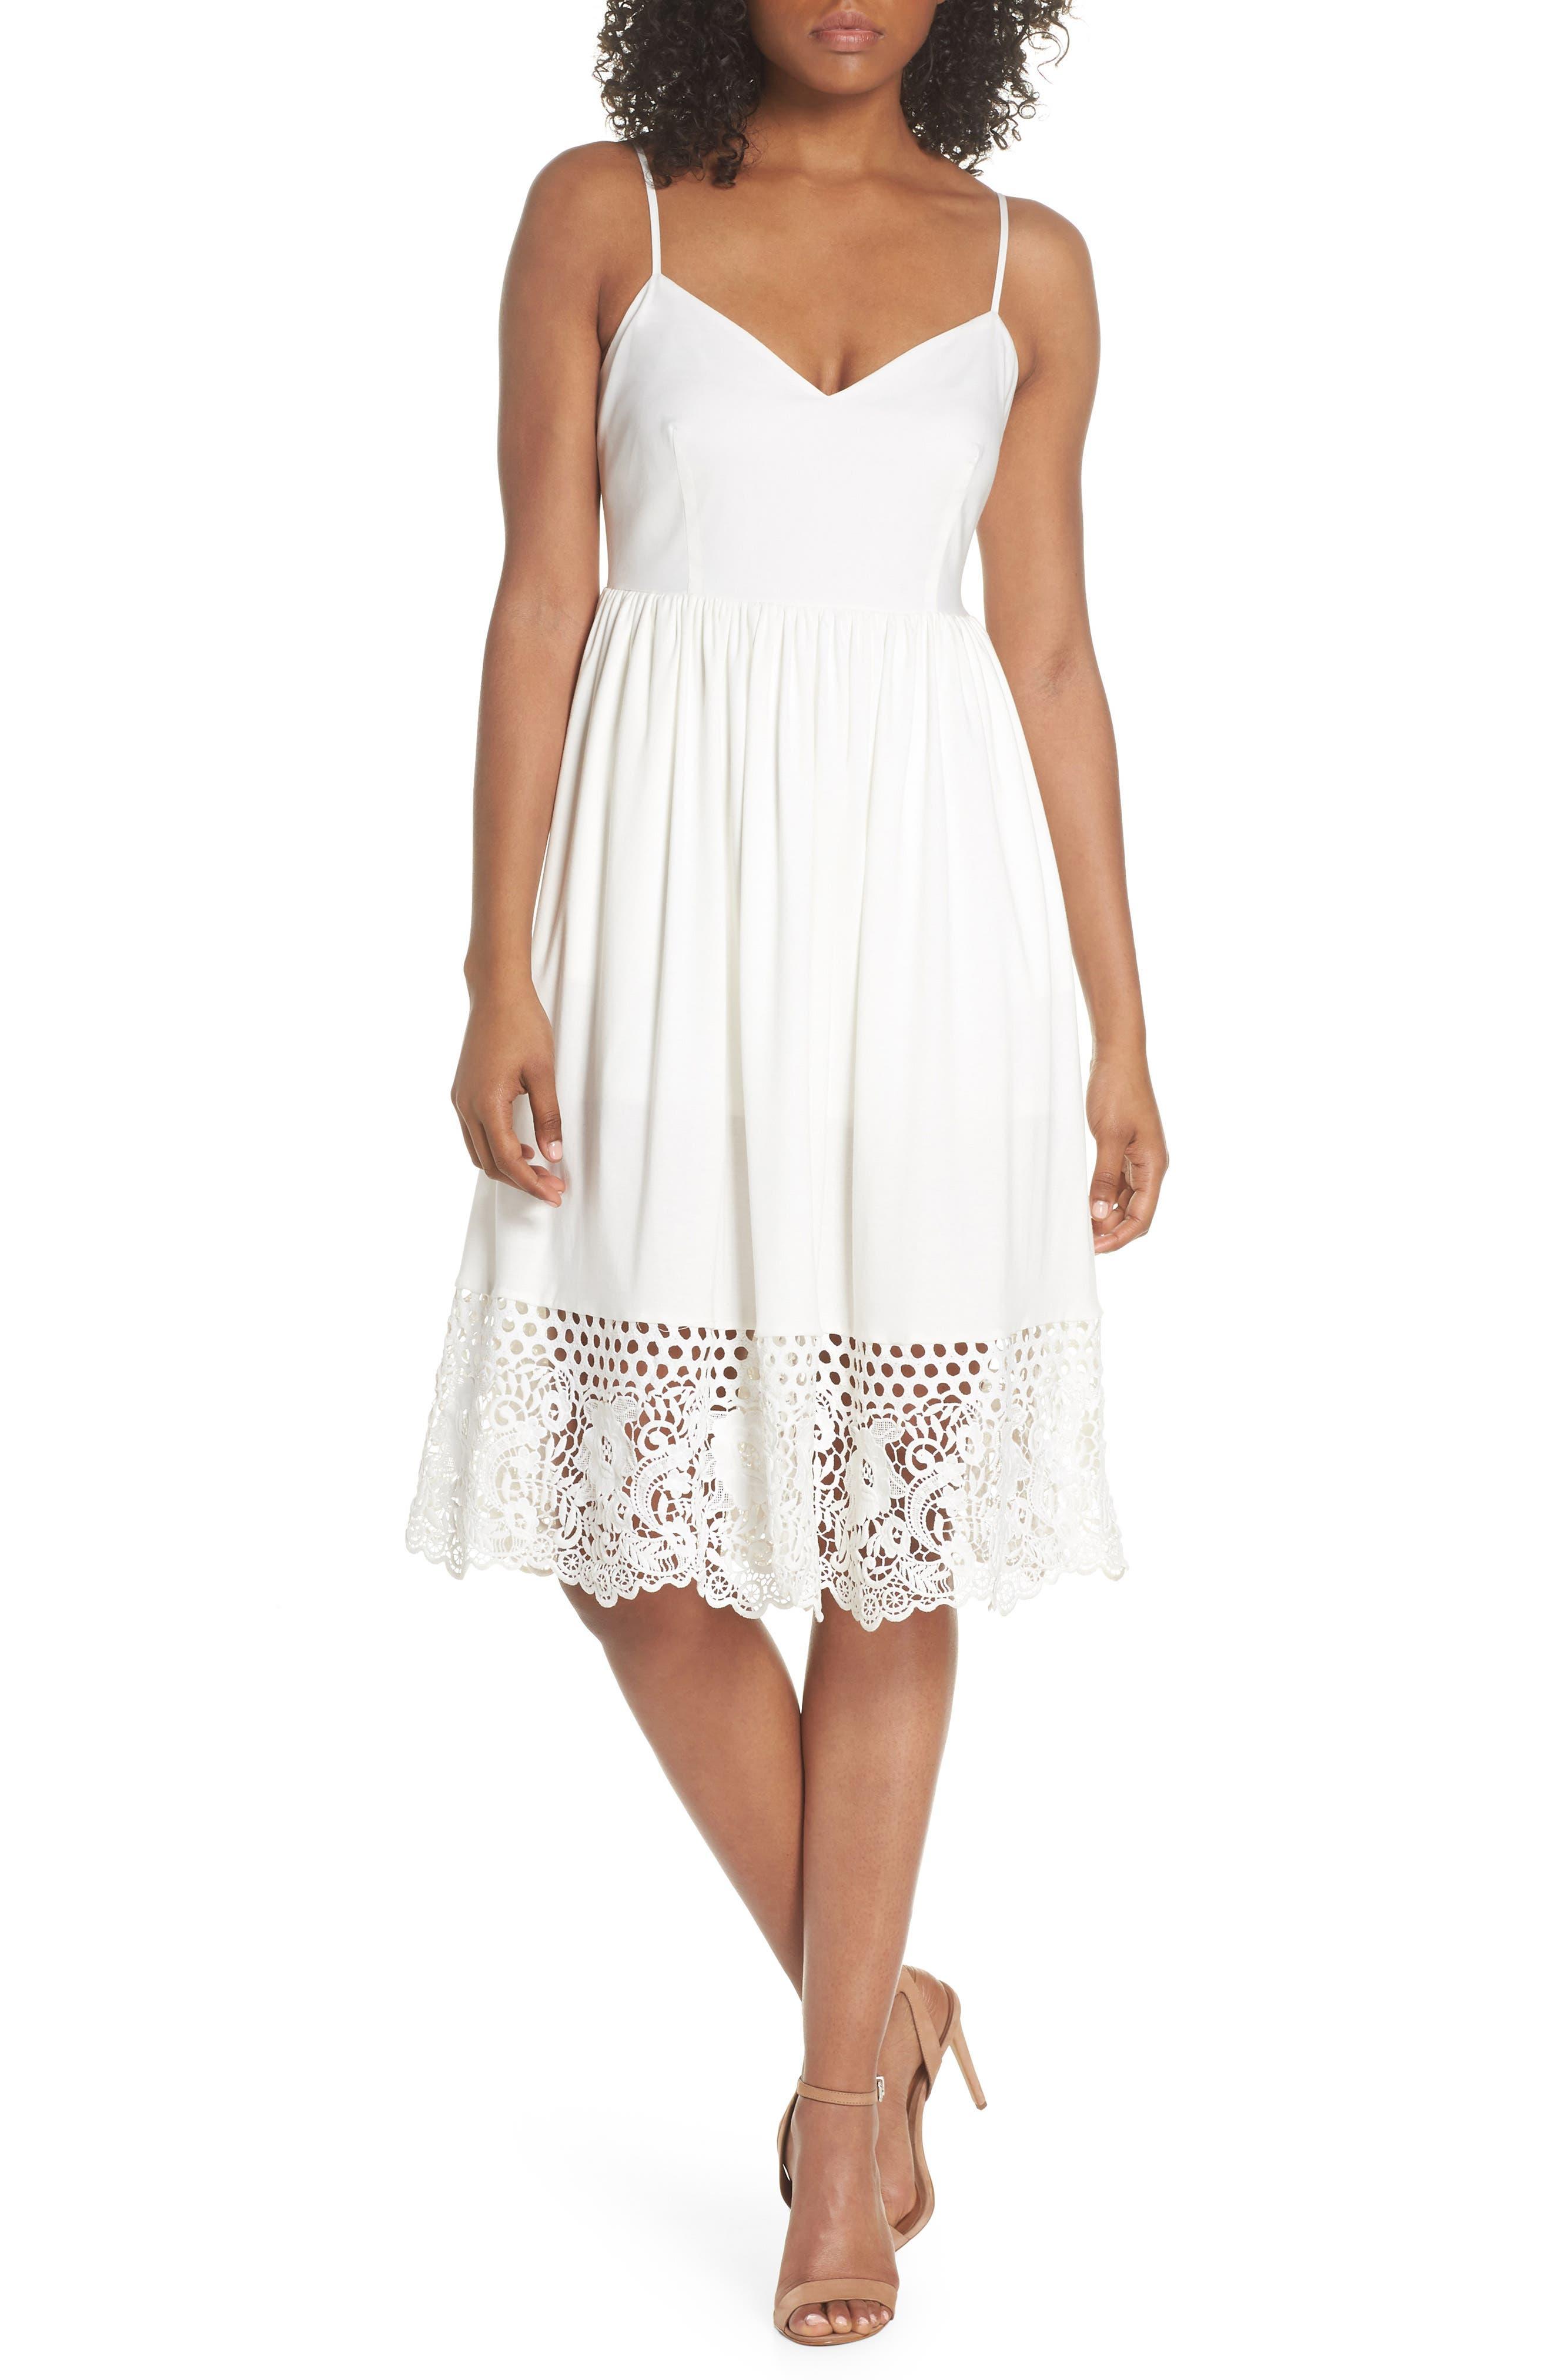 Salerno Lace Trim Jersey Dress,                         Main,                         color, 106